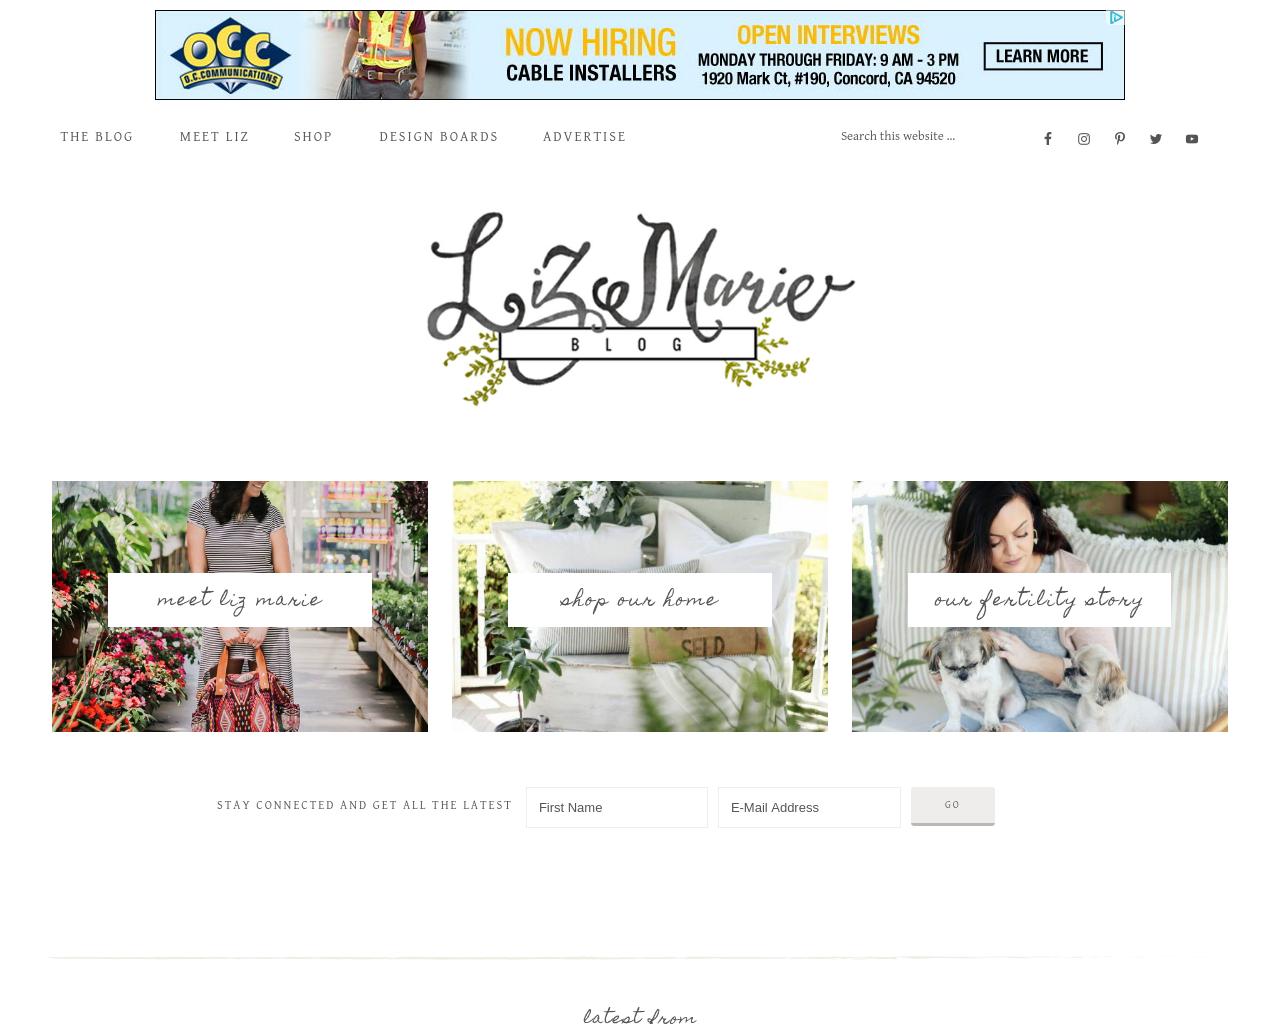 Liz-Marie-Blog-Advertising-Reviews-Pricing